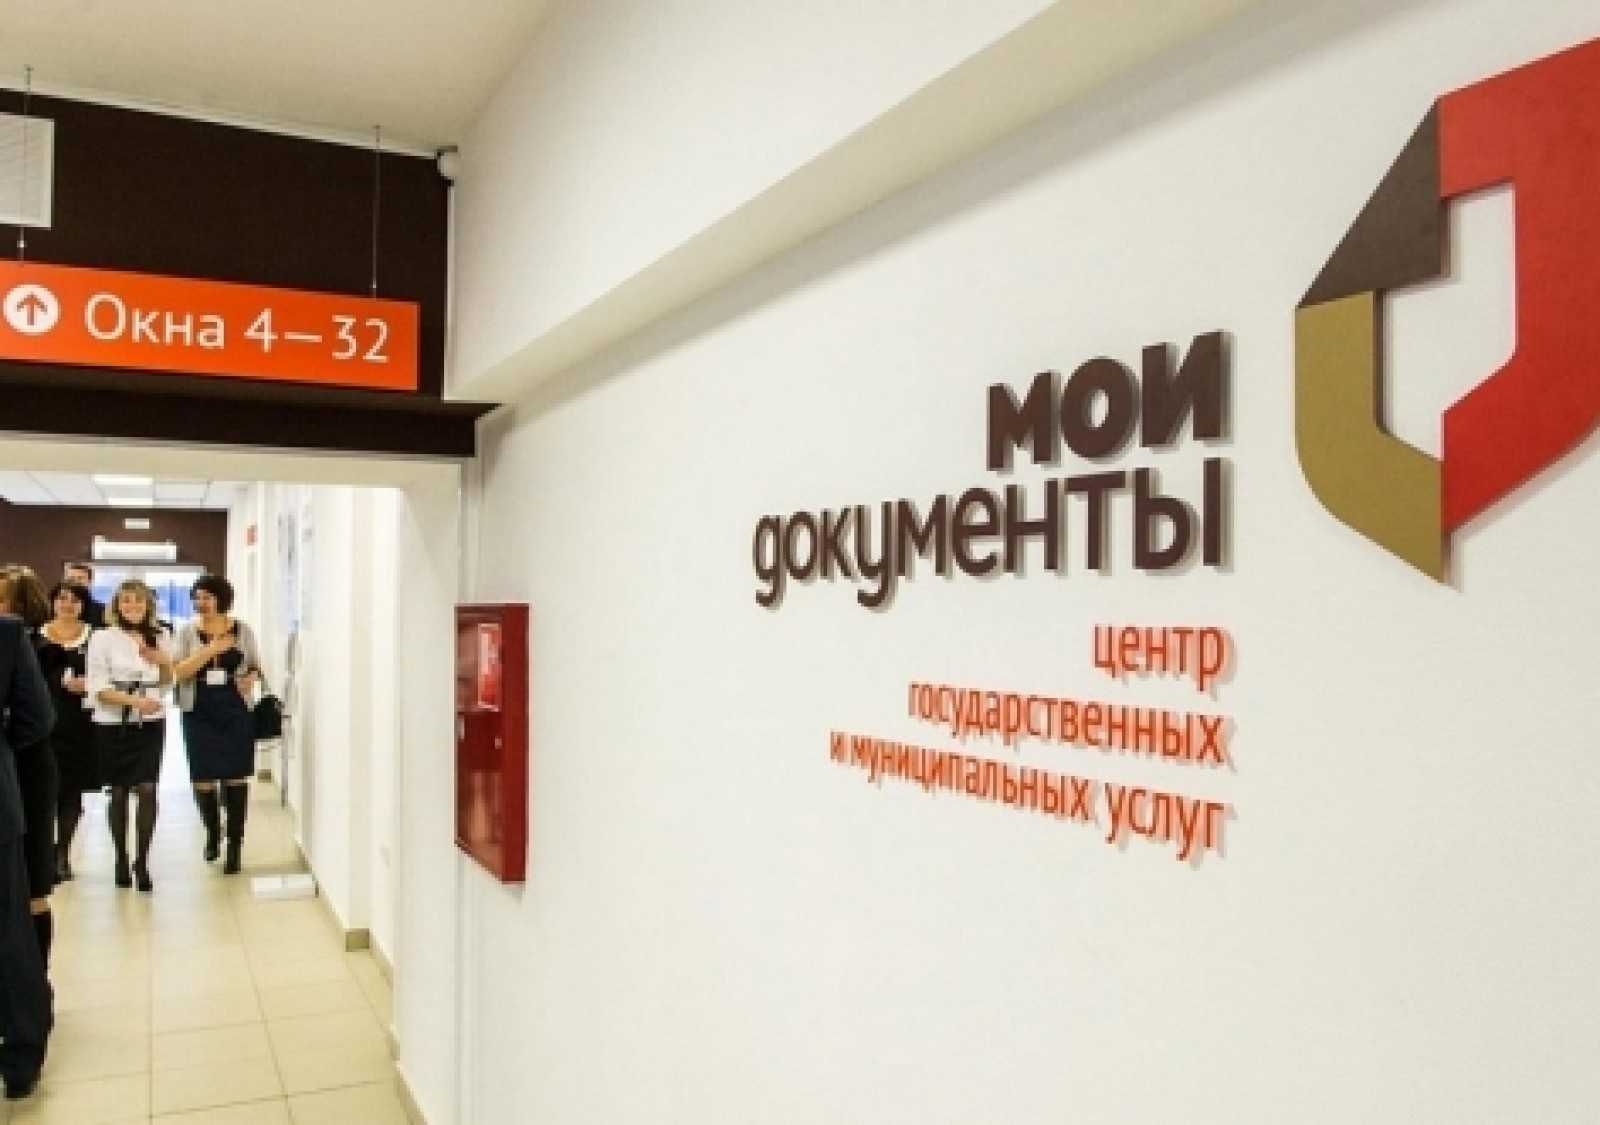 Натерритории Керчи иЕвпатории заработают два больших МФЦ